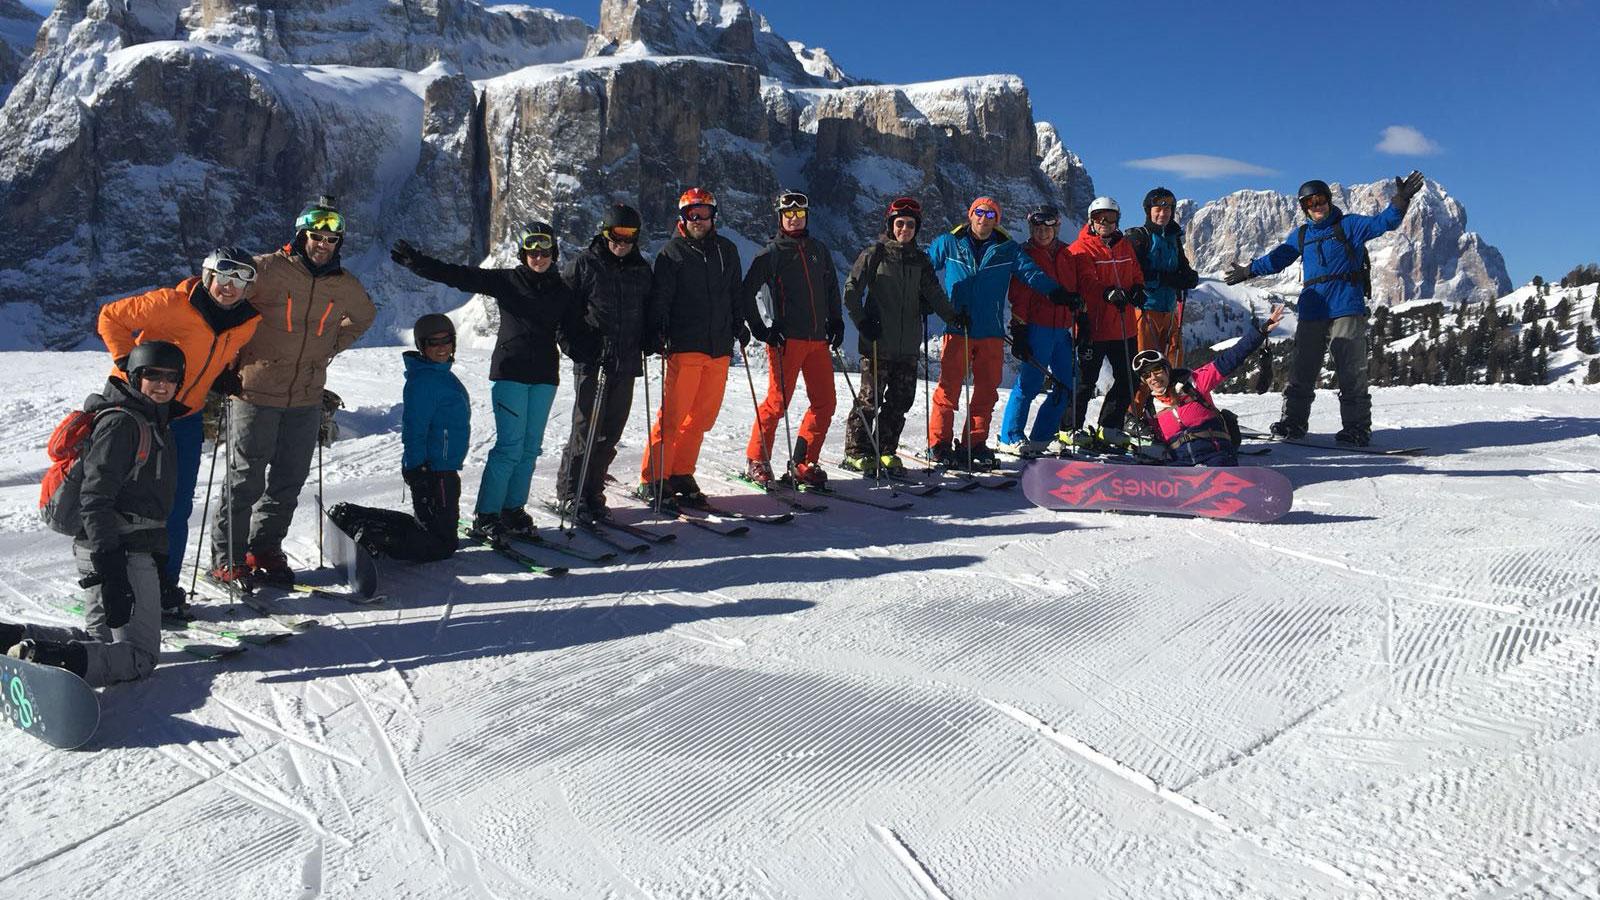 Skihuttentochten en skisafari's